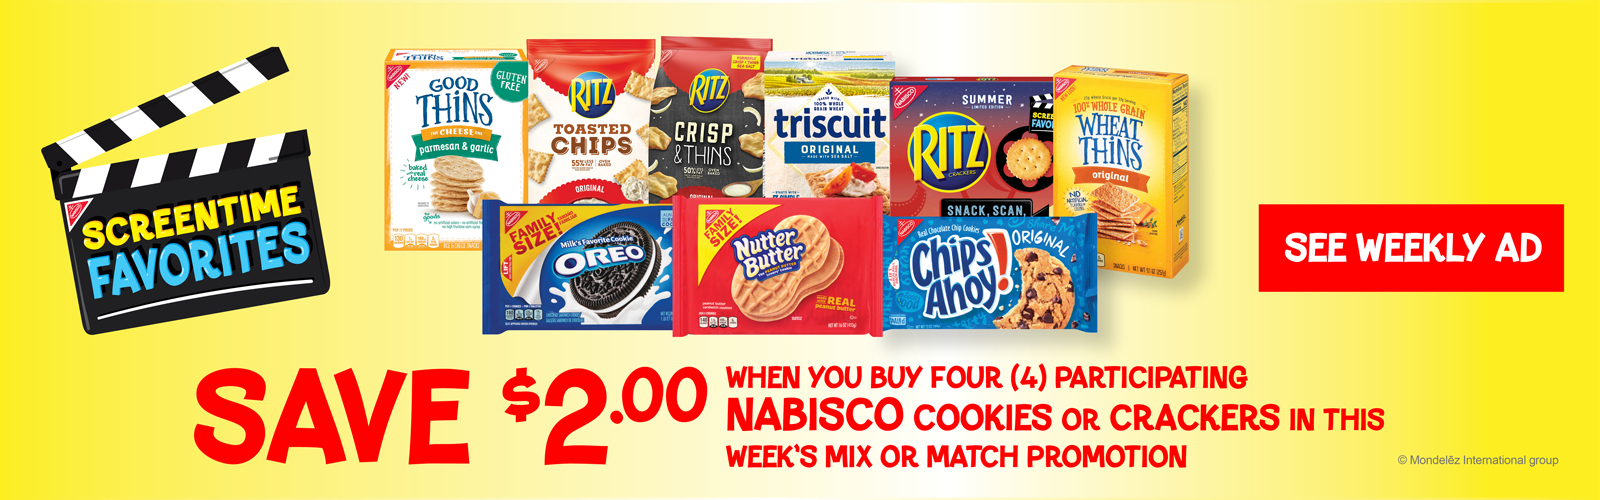 Nabisco Family Size Snacks